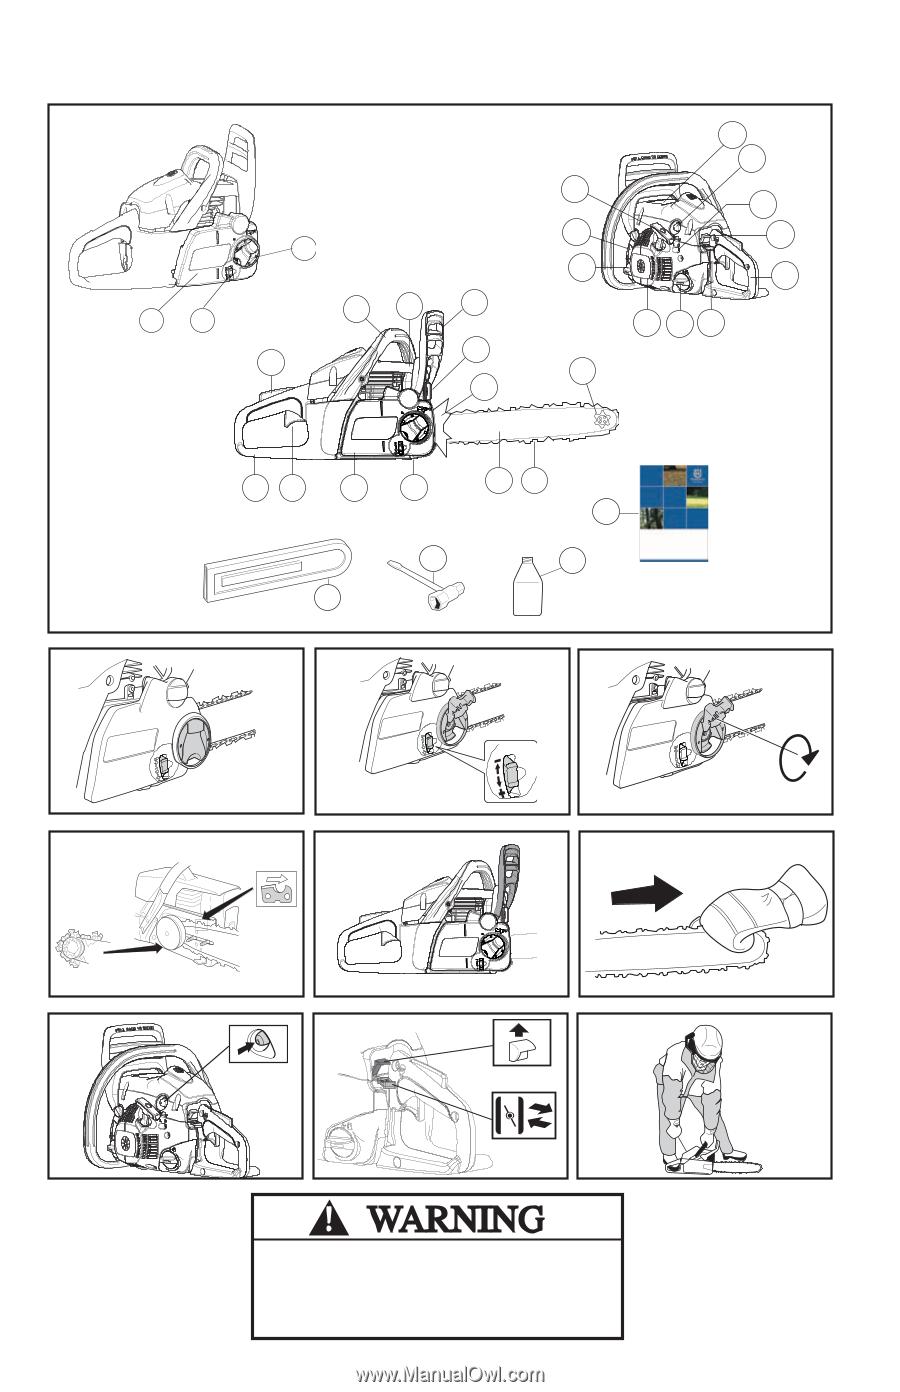 husqvarna 240 operation manual rh manualowl com Husqvarna 240 Chainsaw Manual Oiler Husqvarna 240 Owner's Manual